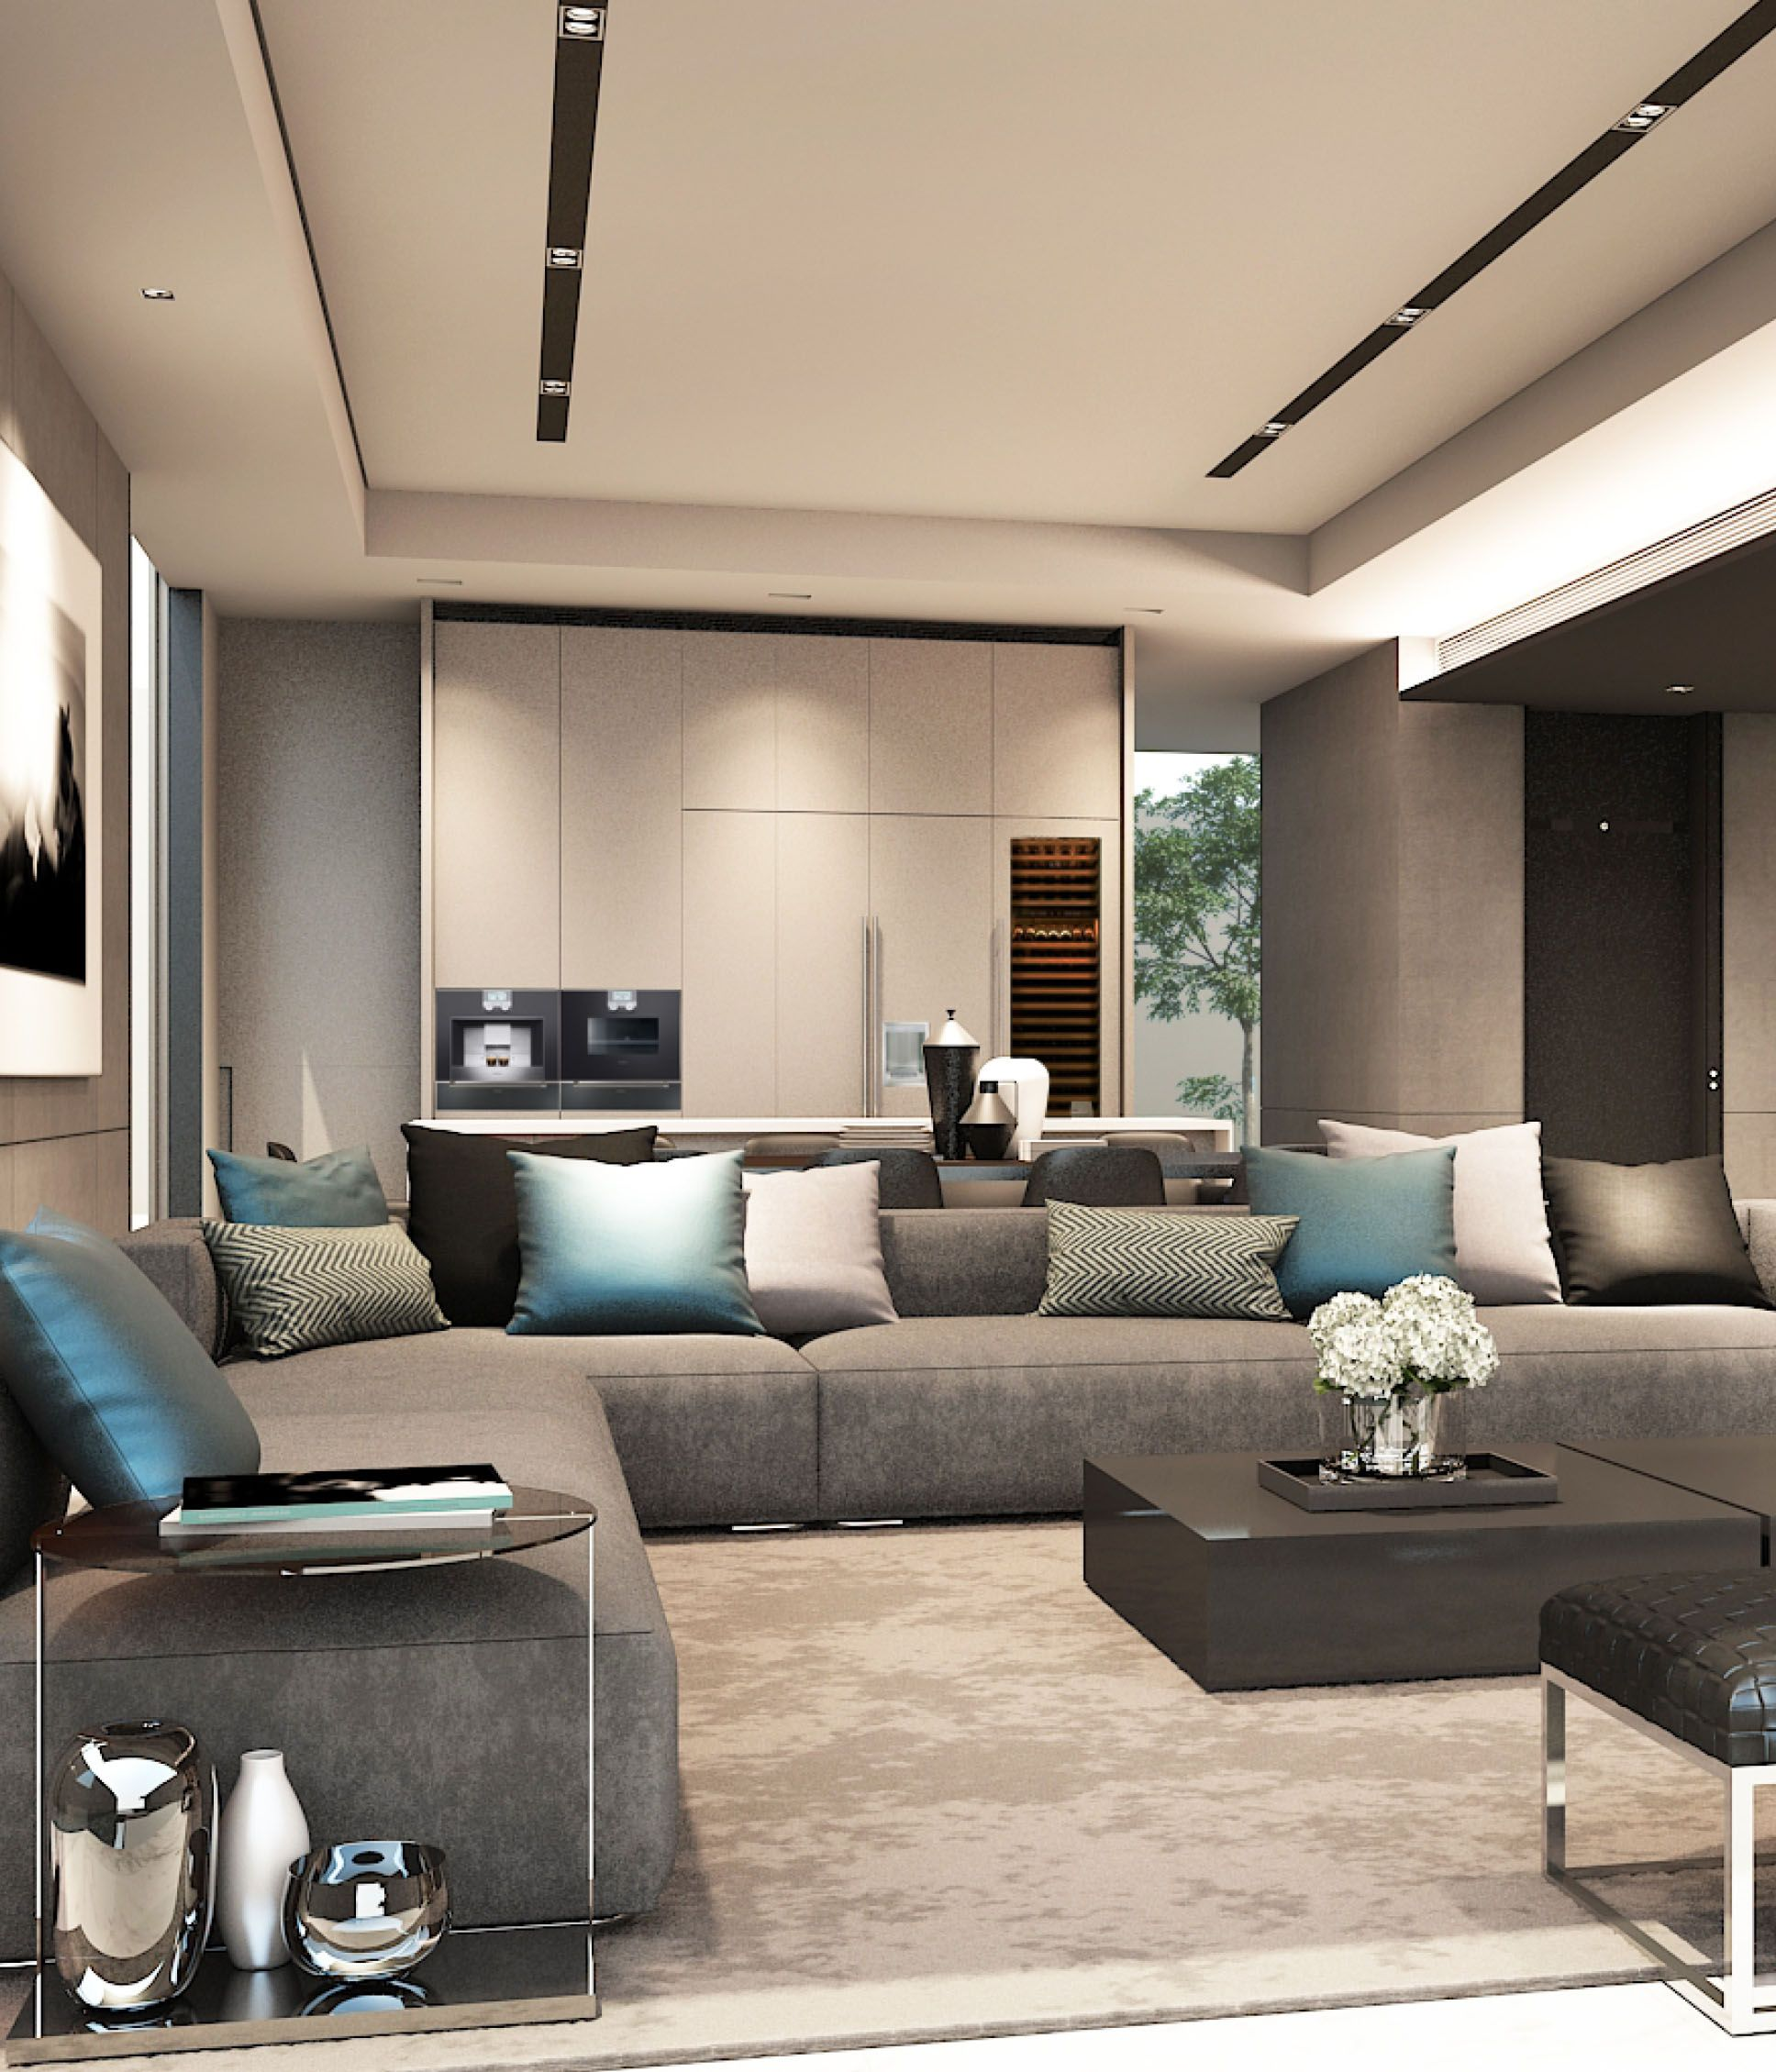 SCDA Mixed-Use Development Sanya, China- Show Villa (Type 1 ...